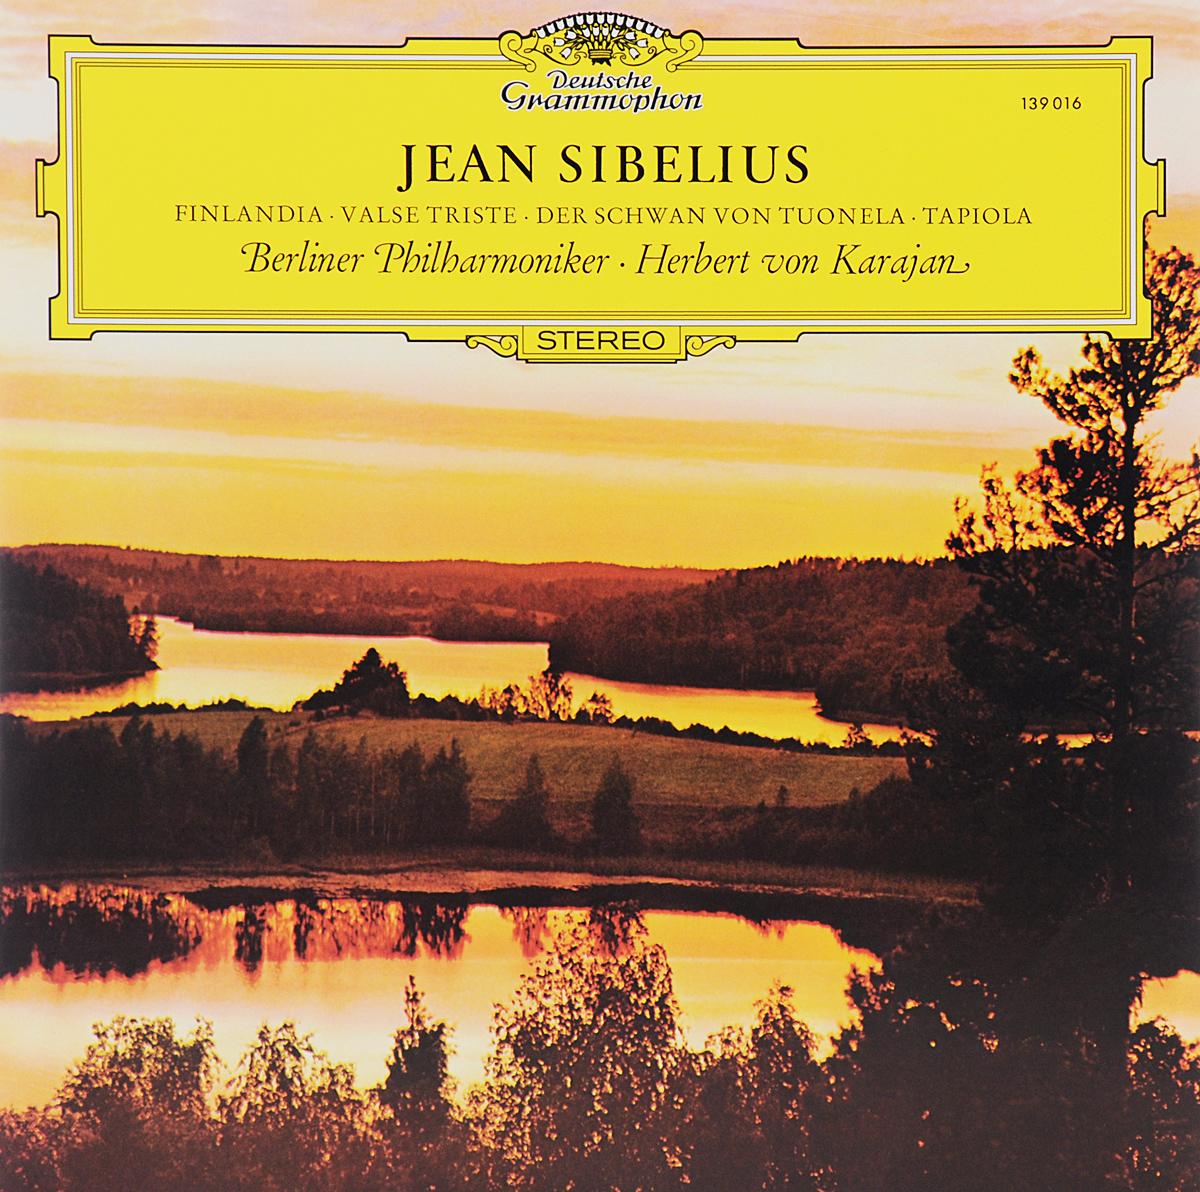 цены  Герберт Караян,Berliner Philharmoniker Herbert Von Karajan. Jean Sibelius. Finlandia / Valse Triste / Der Schwan Von Tuonela / Tapiola (LP)